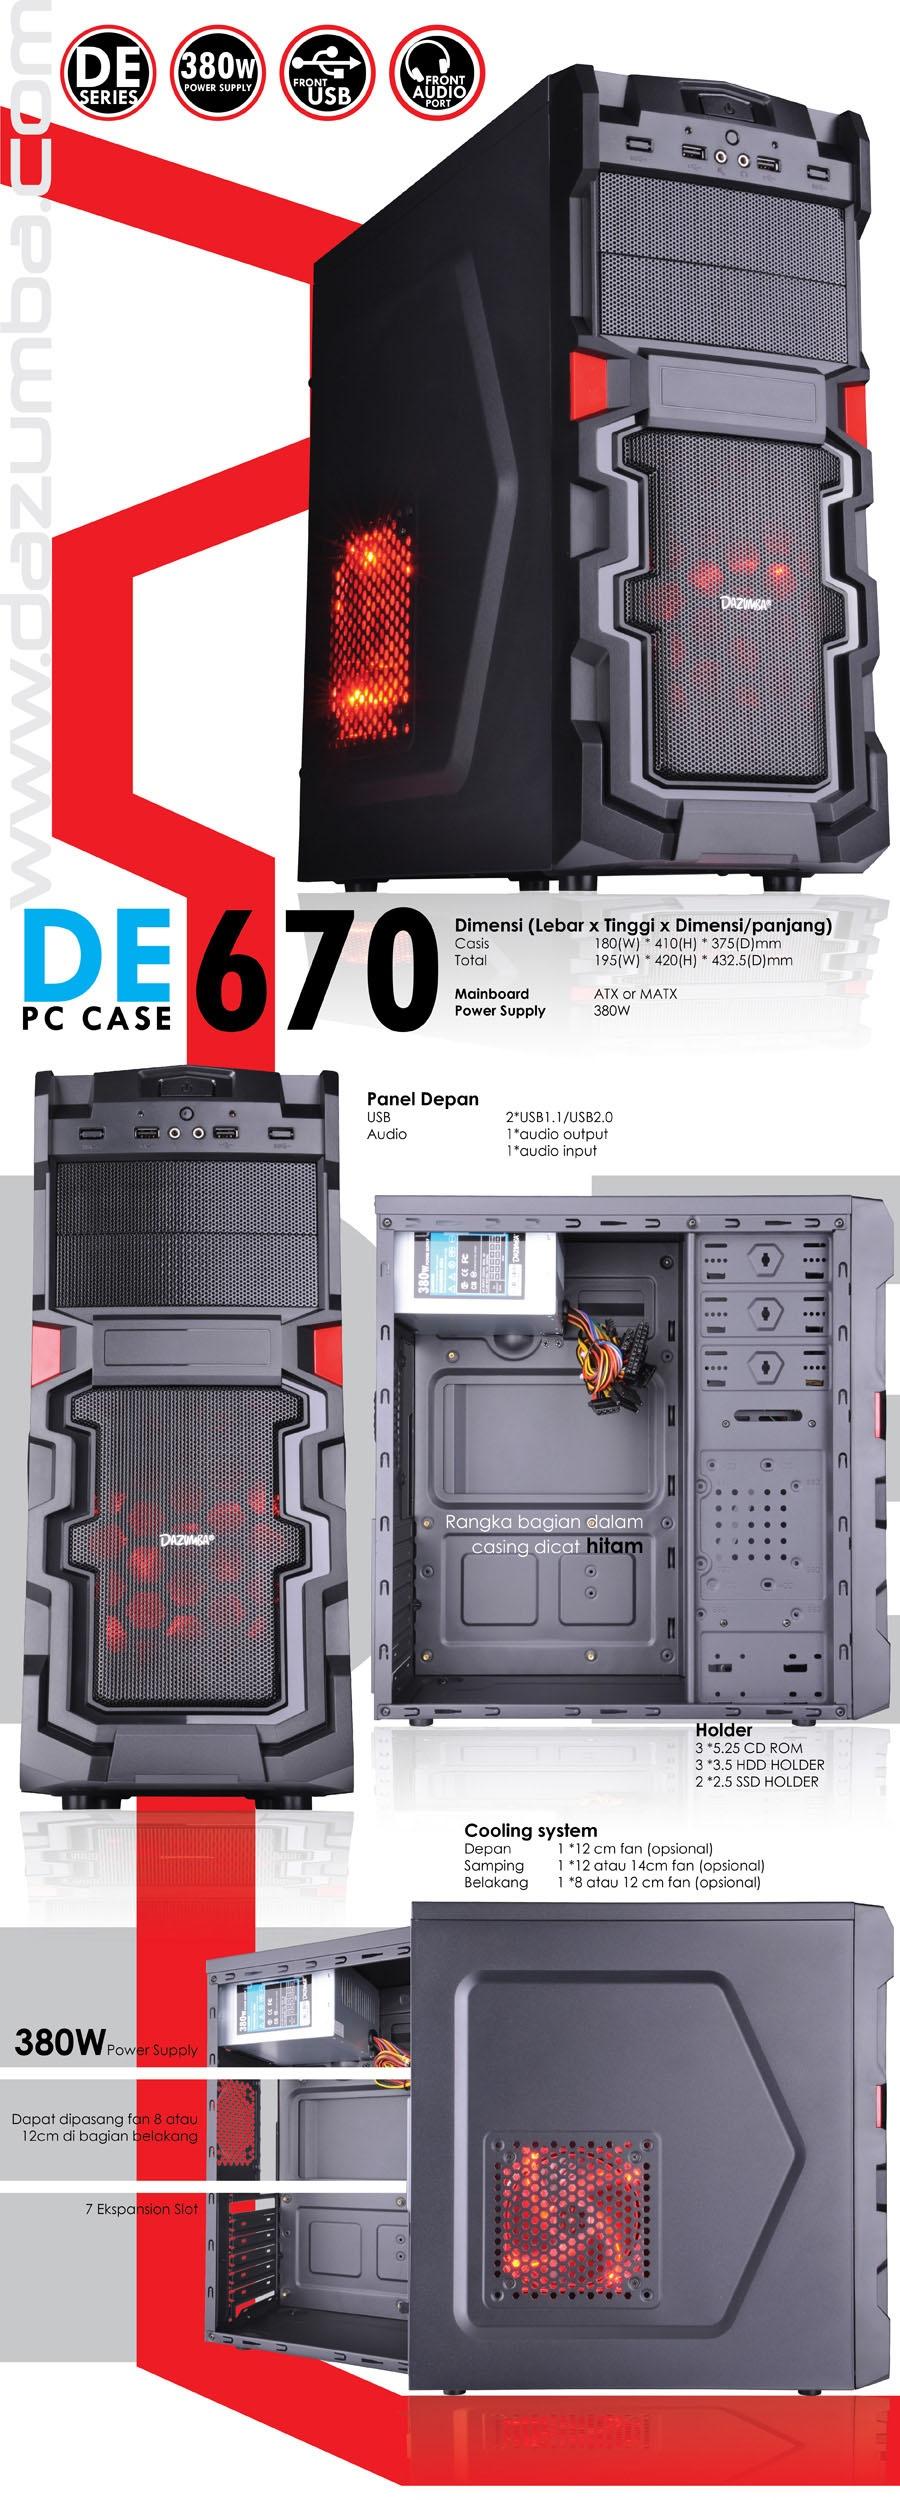 Dazumba Gaming Computer Case De 670 Power Supply Ps 380w Adaptor Epson Tmu 220 Tmt81 82 Tmu950 180 Original New Deskripsi Produk Image Kata Kunci Juga Dicari Harga Saya